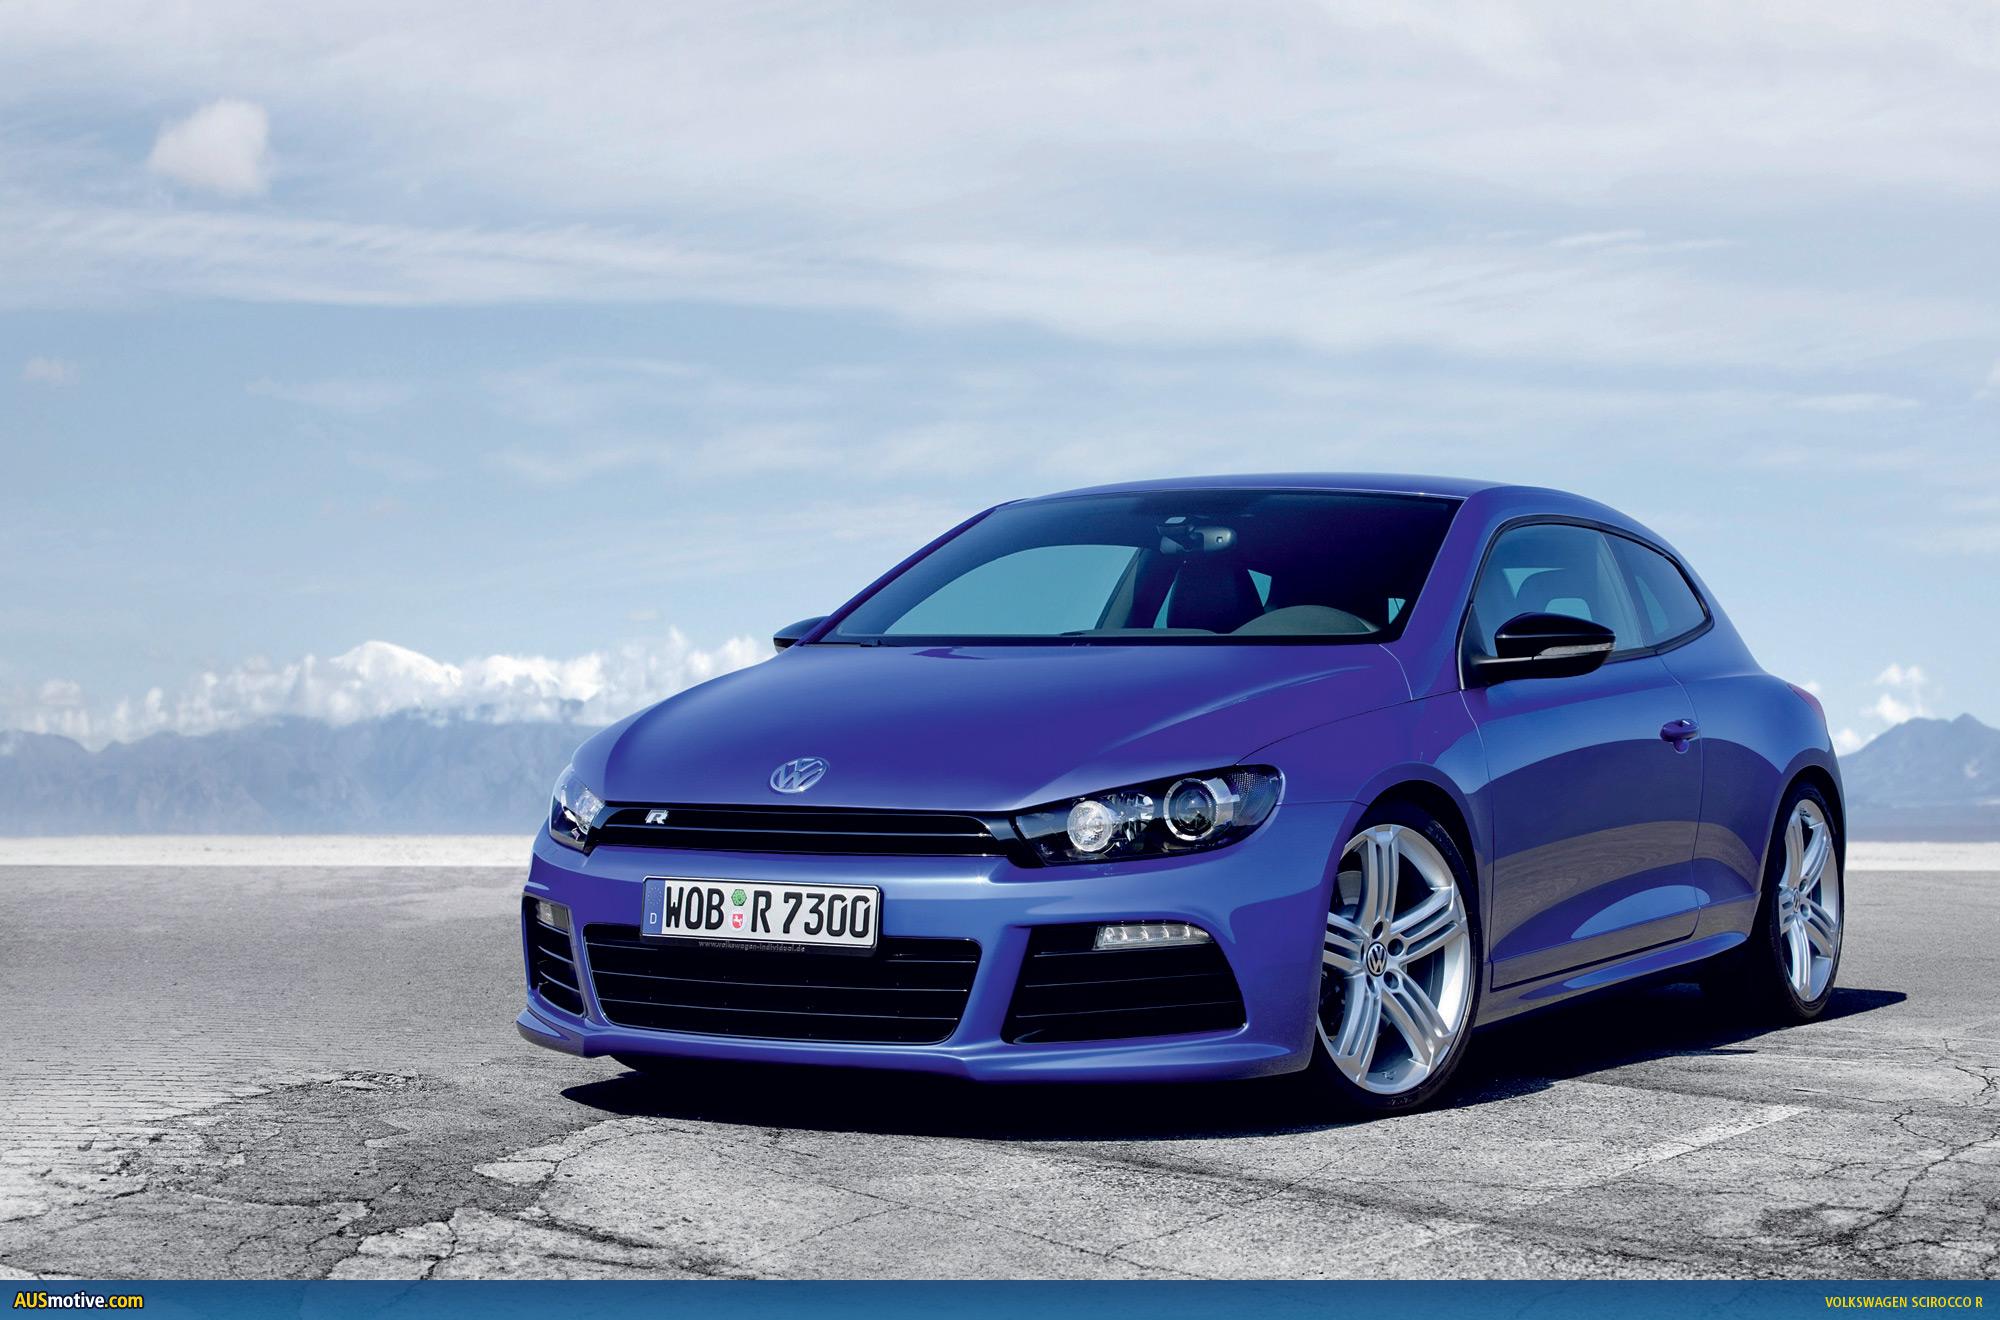 AUSmotivecom  Volkswagen Scirocco R  official details